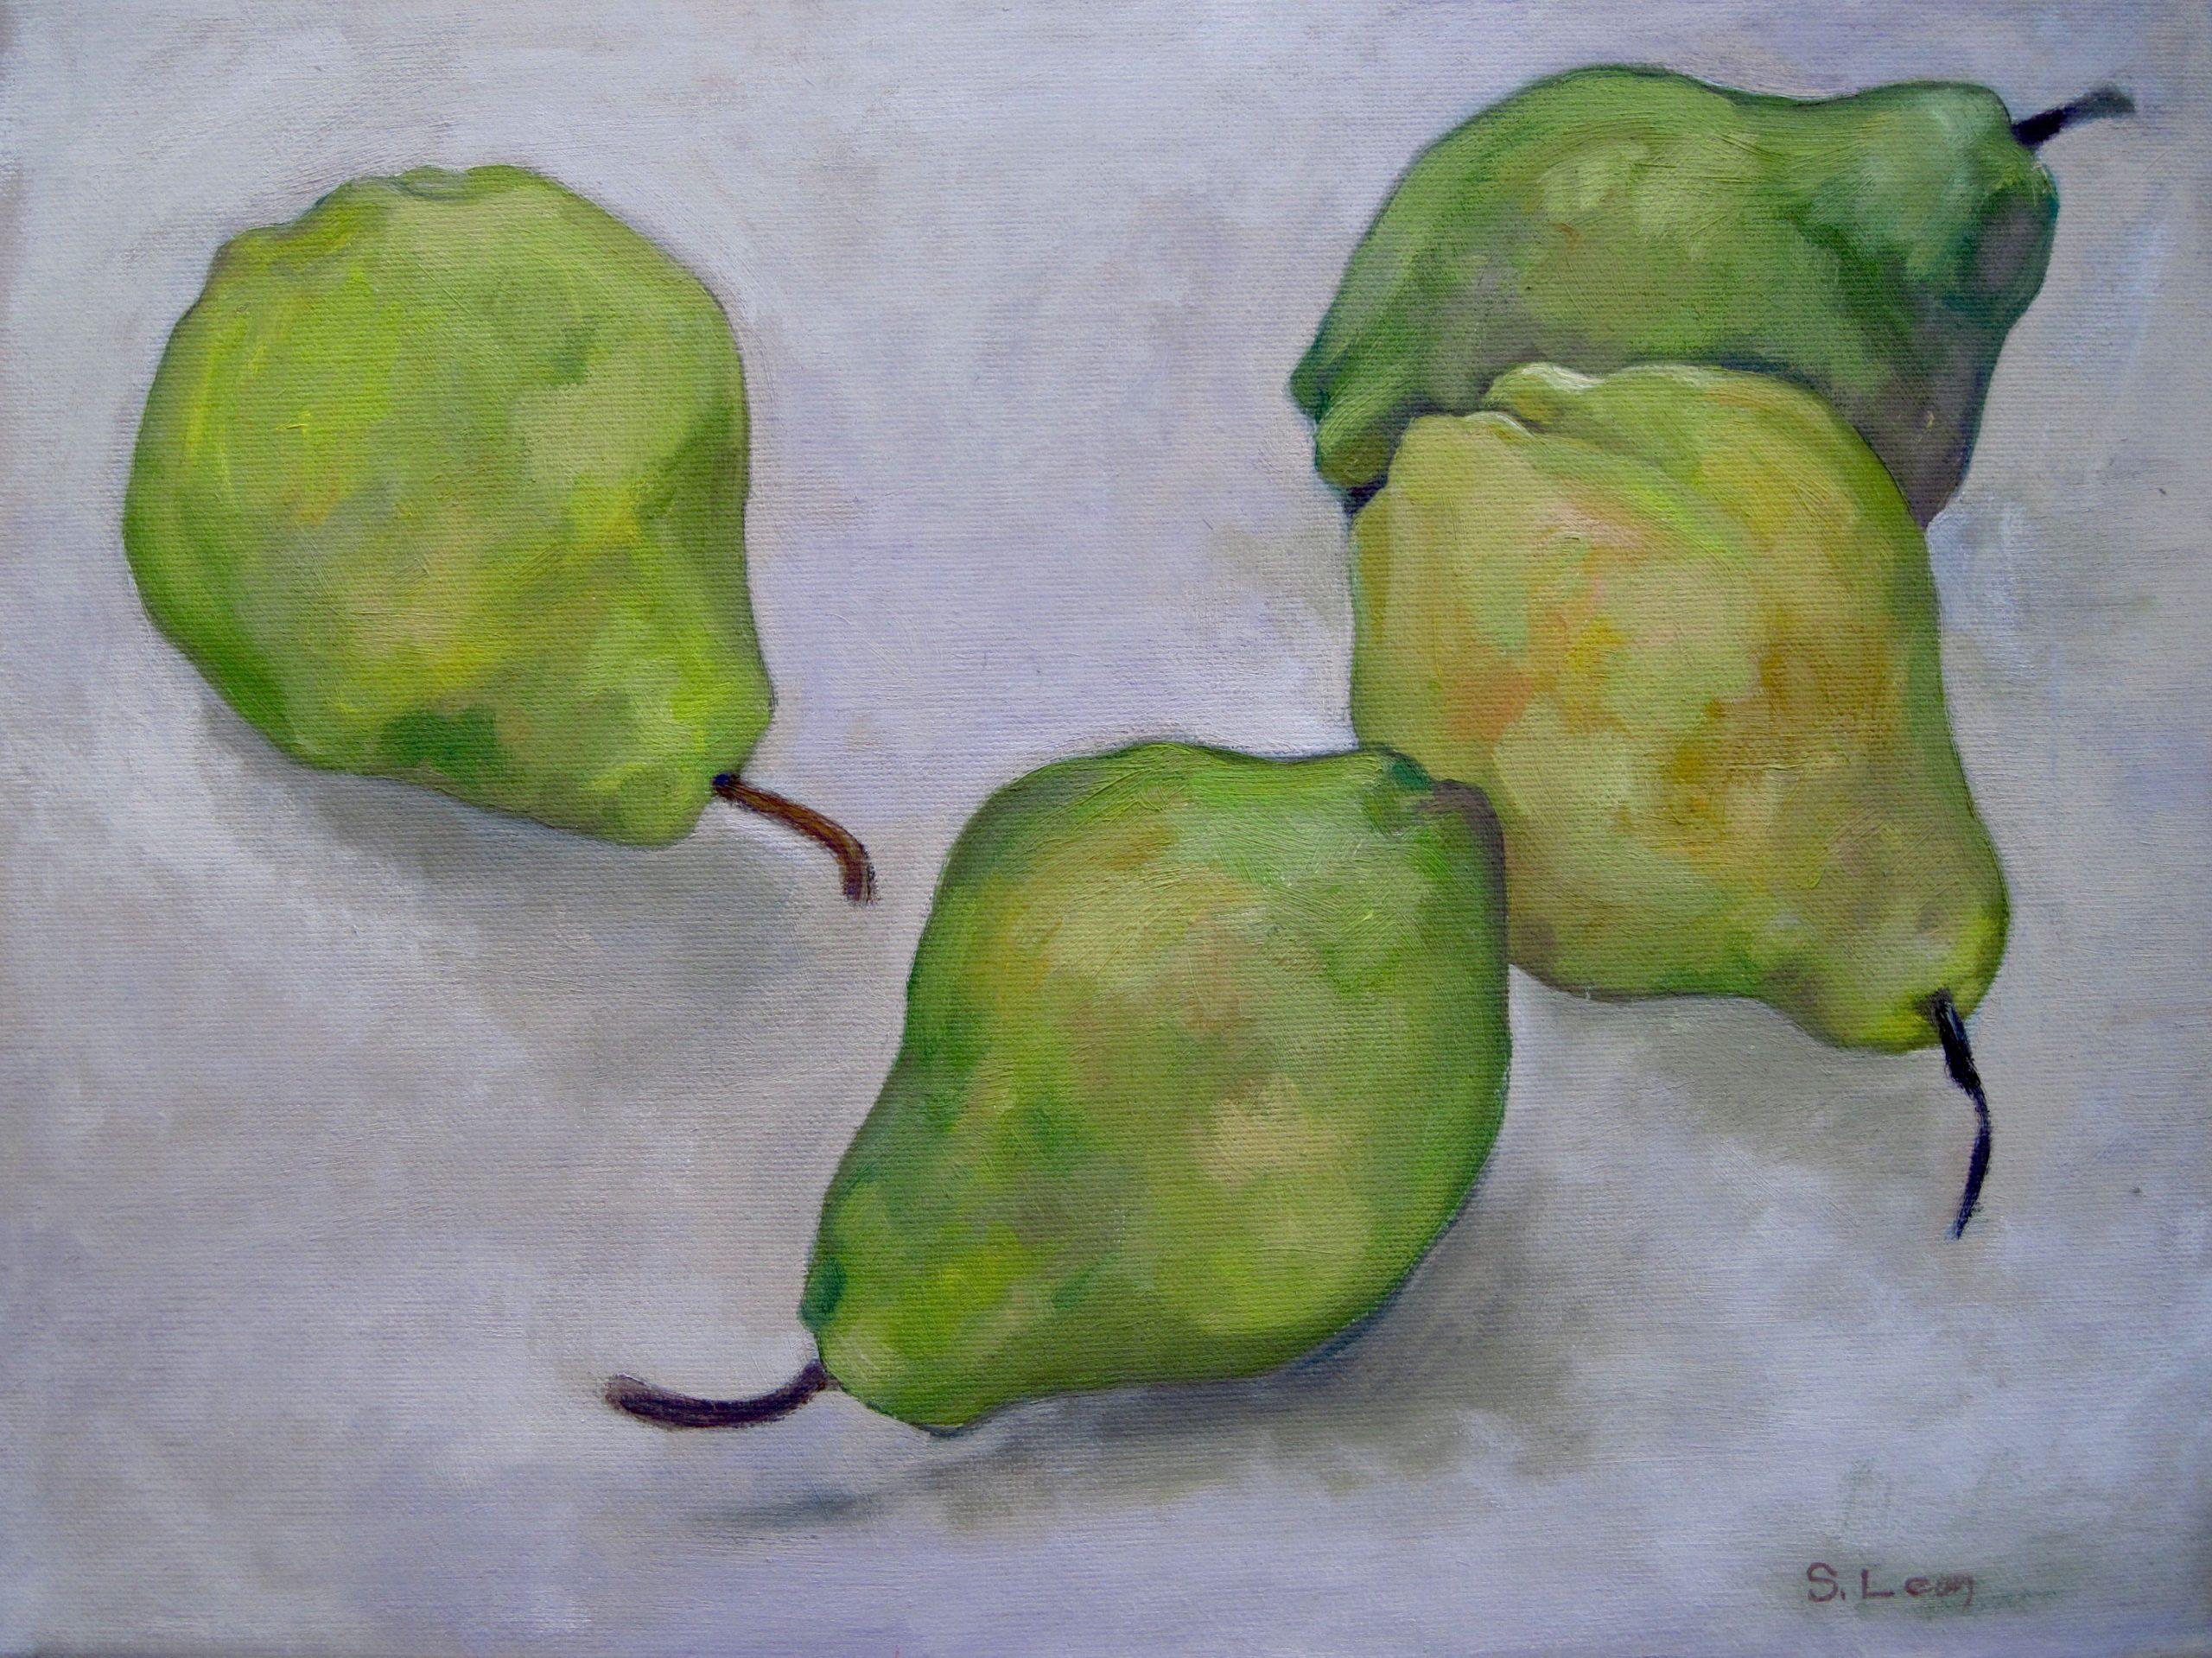 Sarah Leon, Pears, Waltham Open Studios 2021